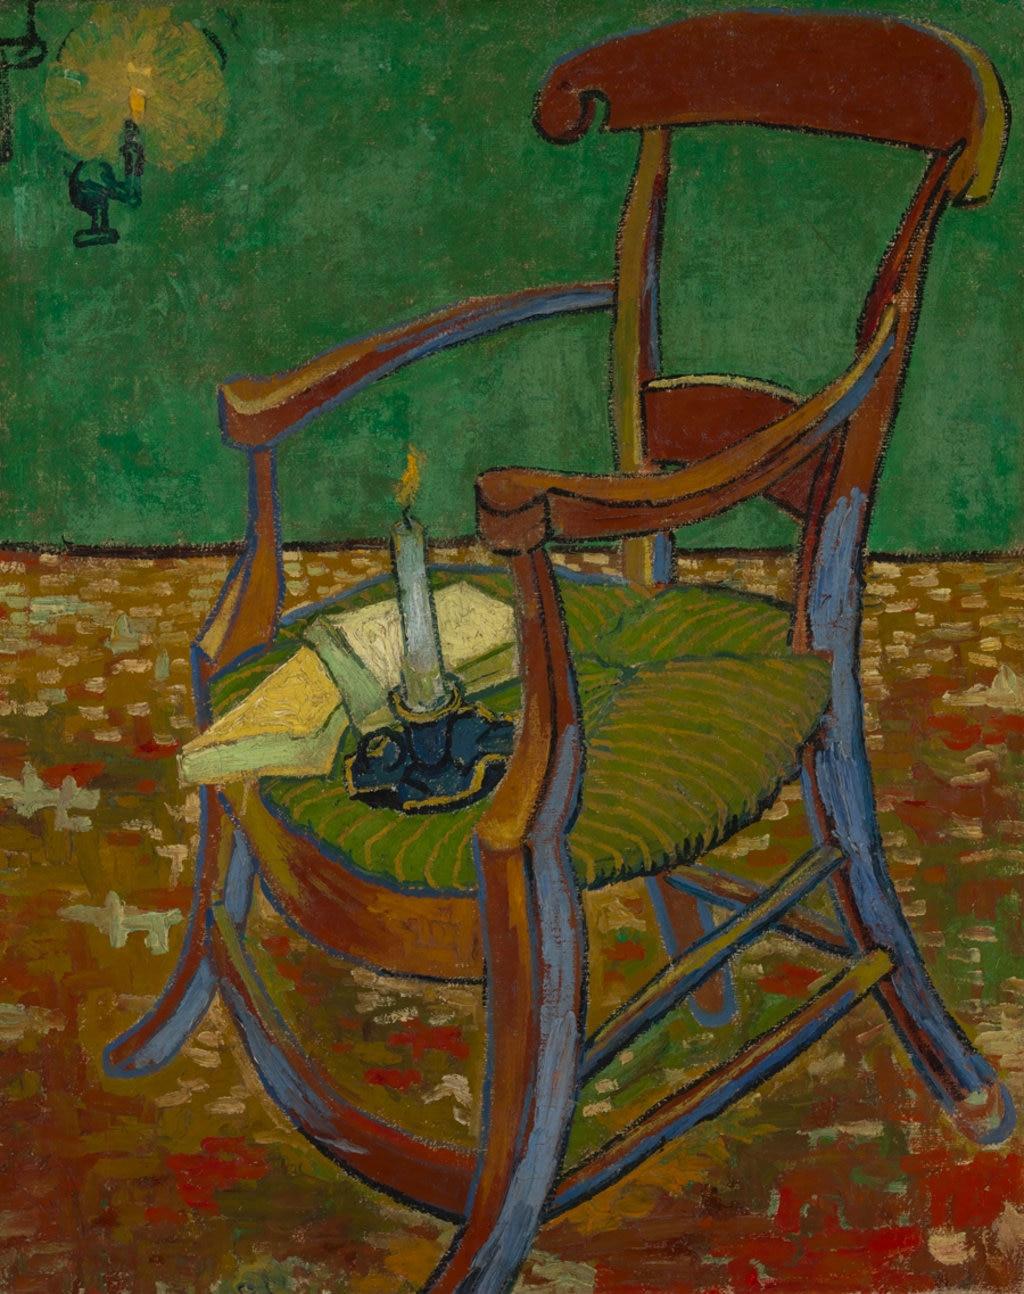 Vincent van Gogh, La sedia di Gauguin, 1888. Courtesy of the Van Gogh Museum, Amsterdam